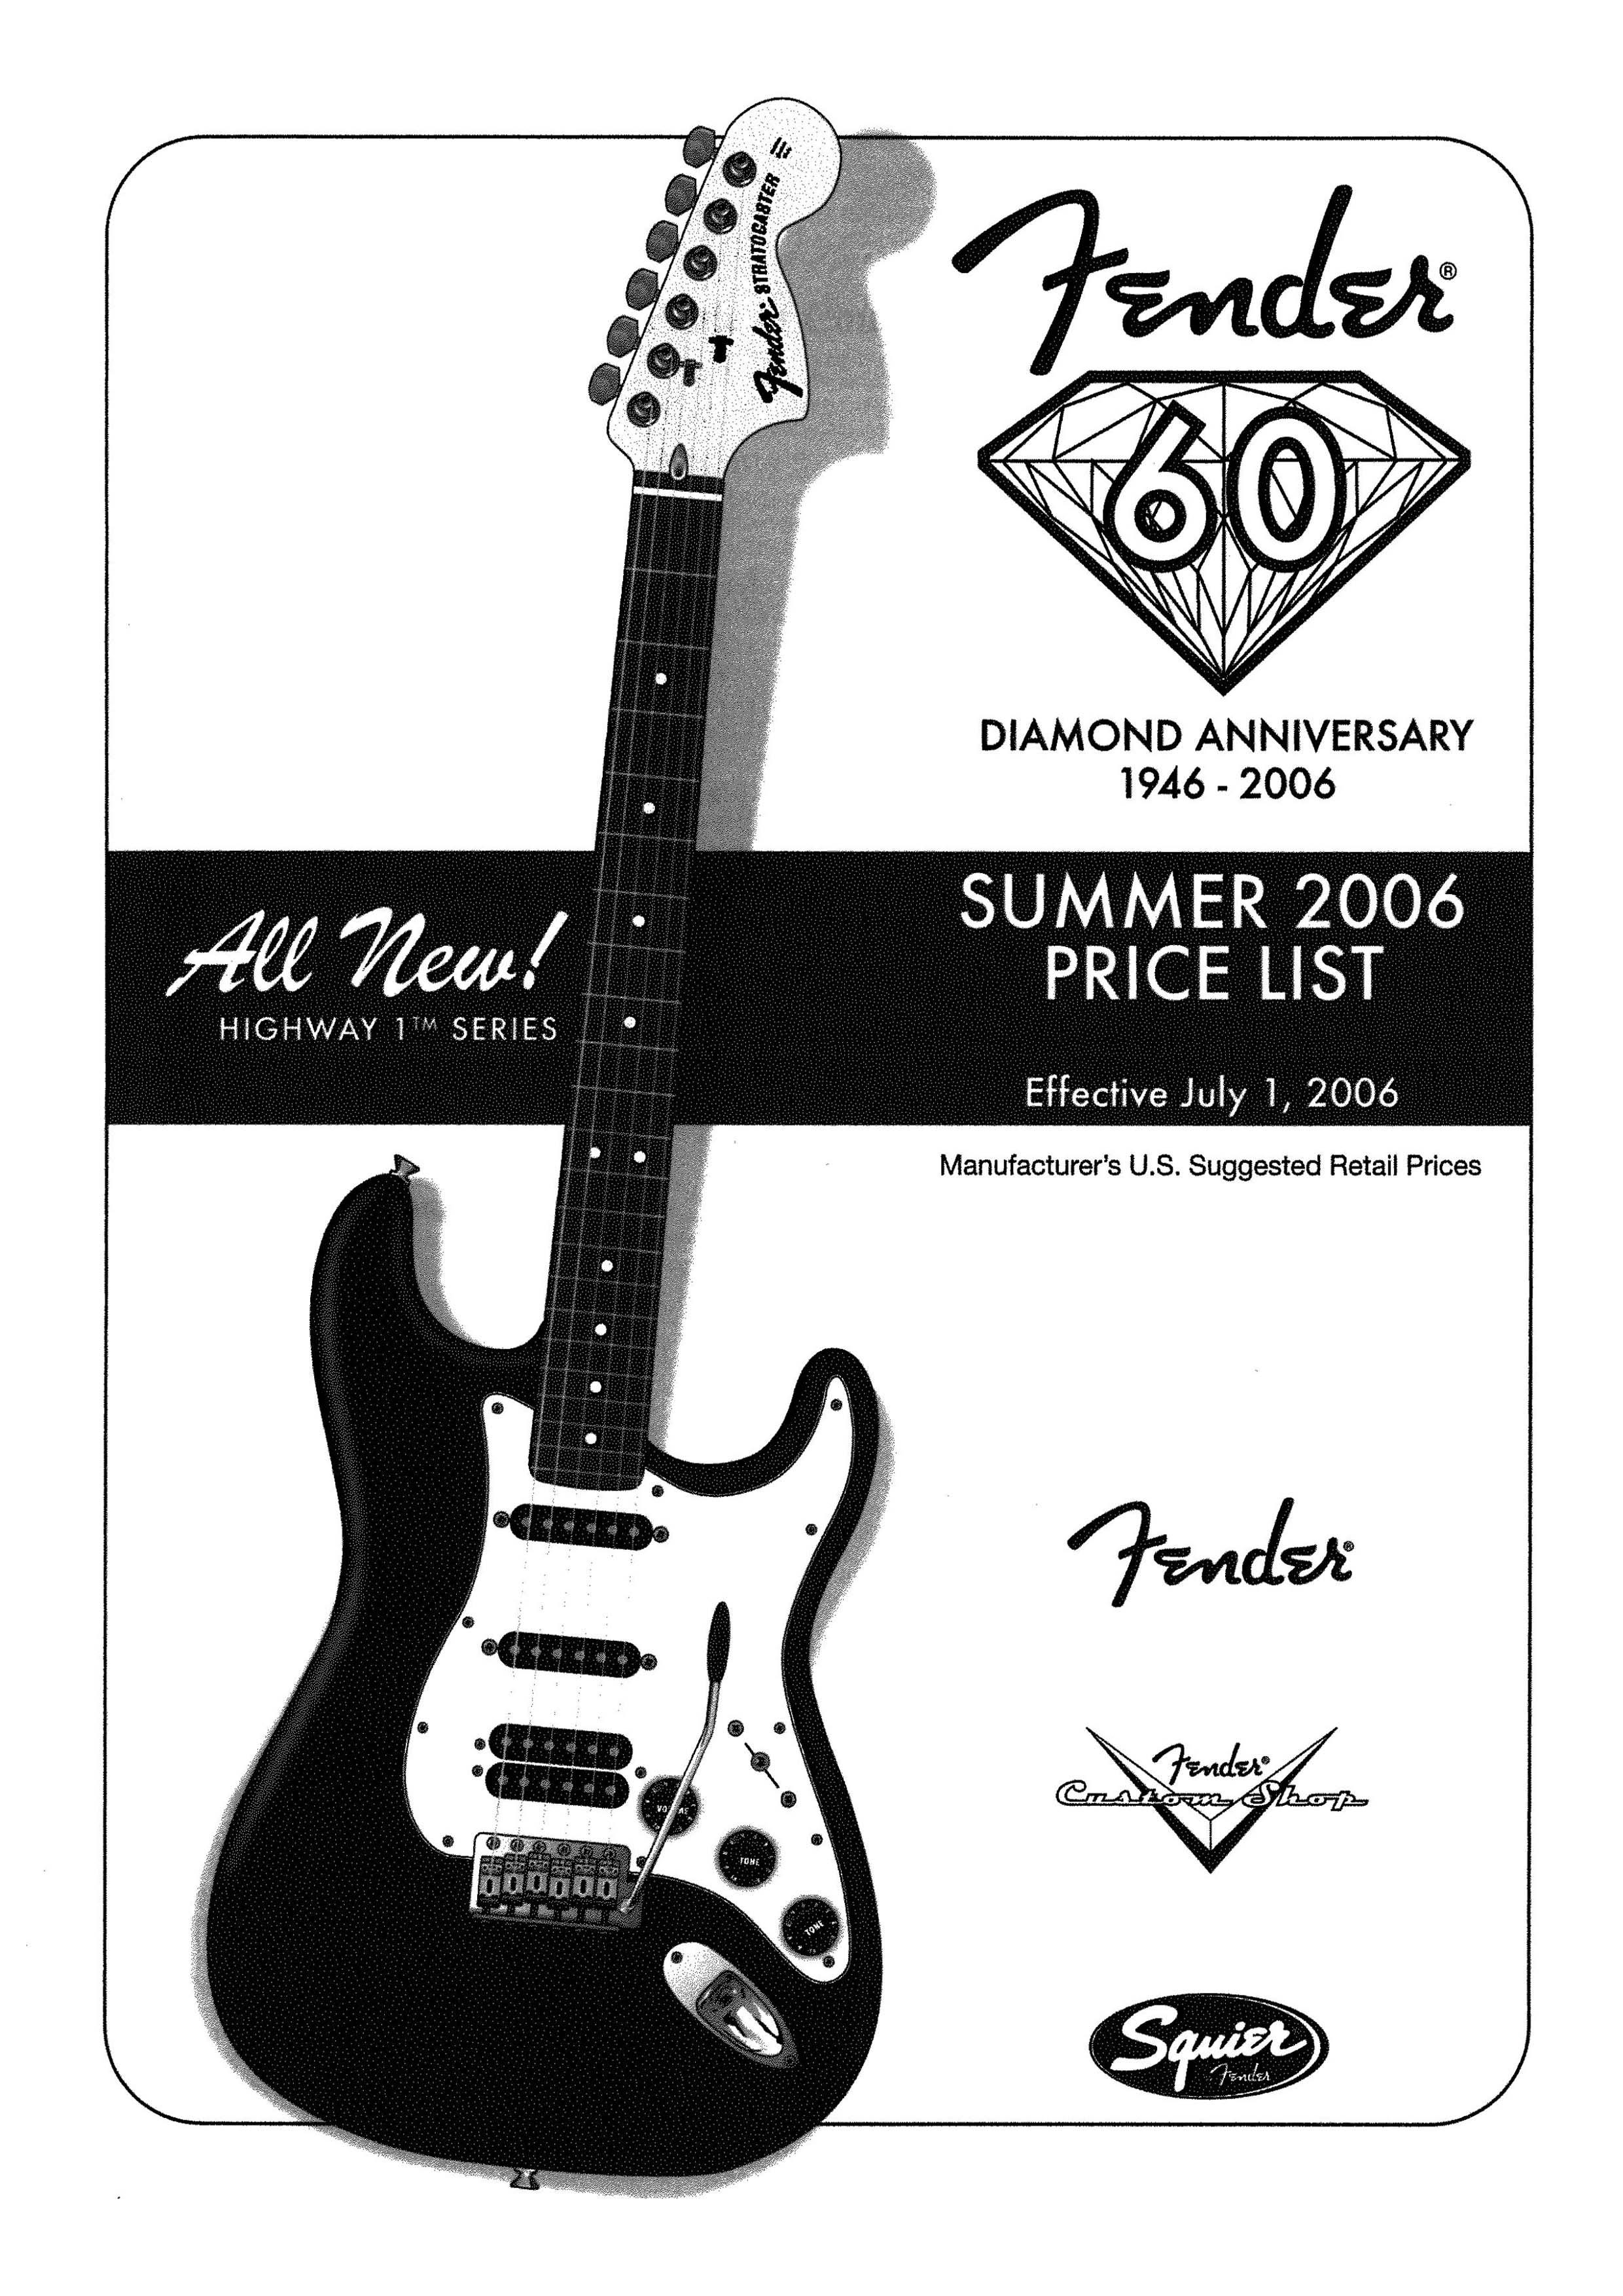 Fender Price list 2006